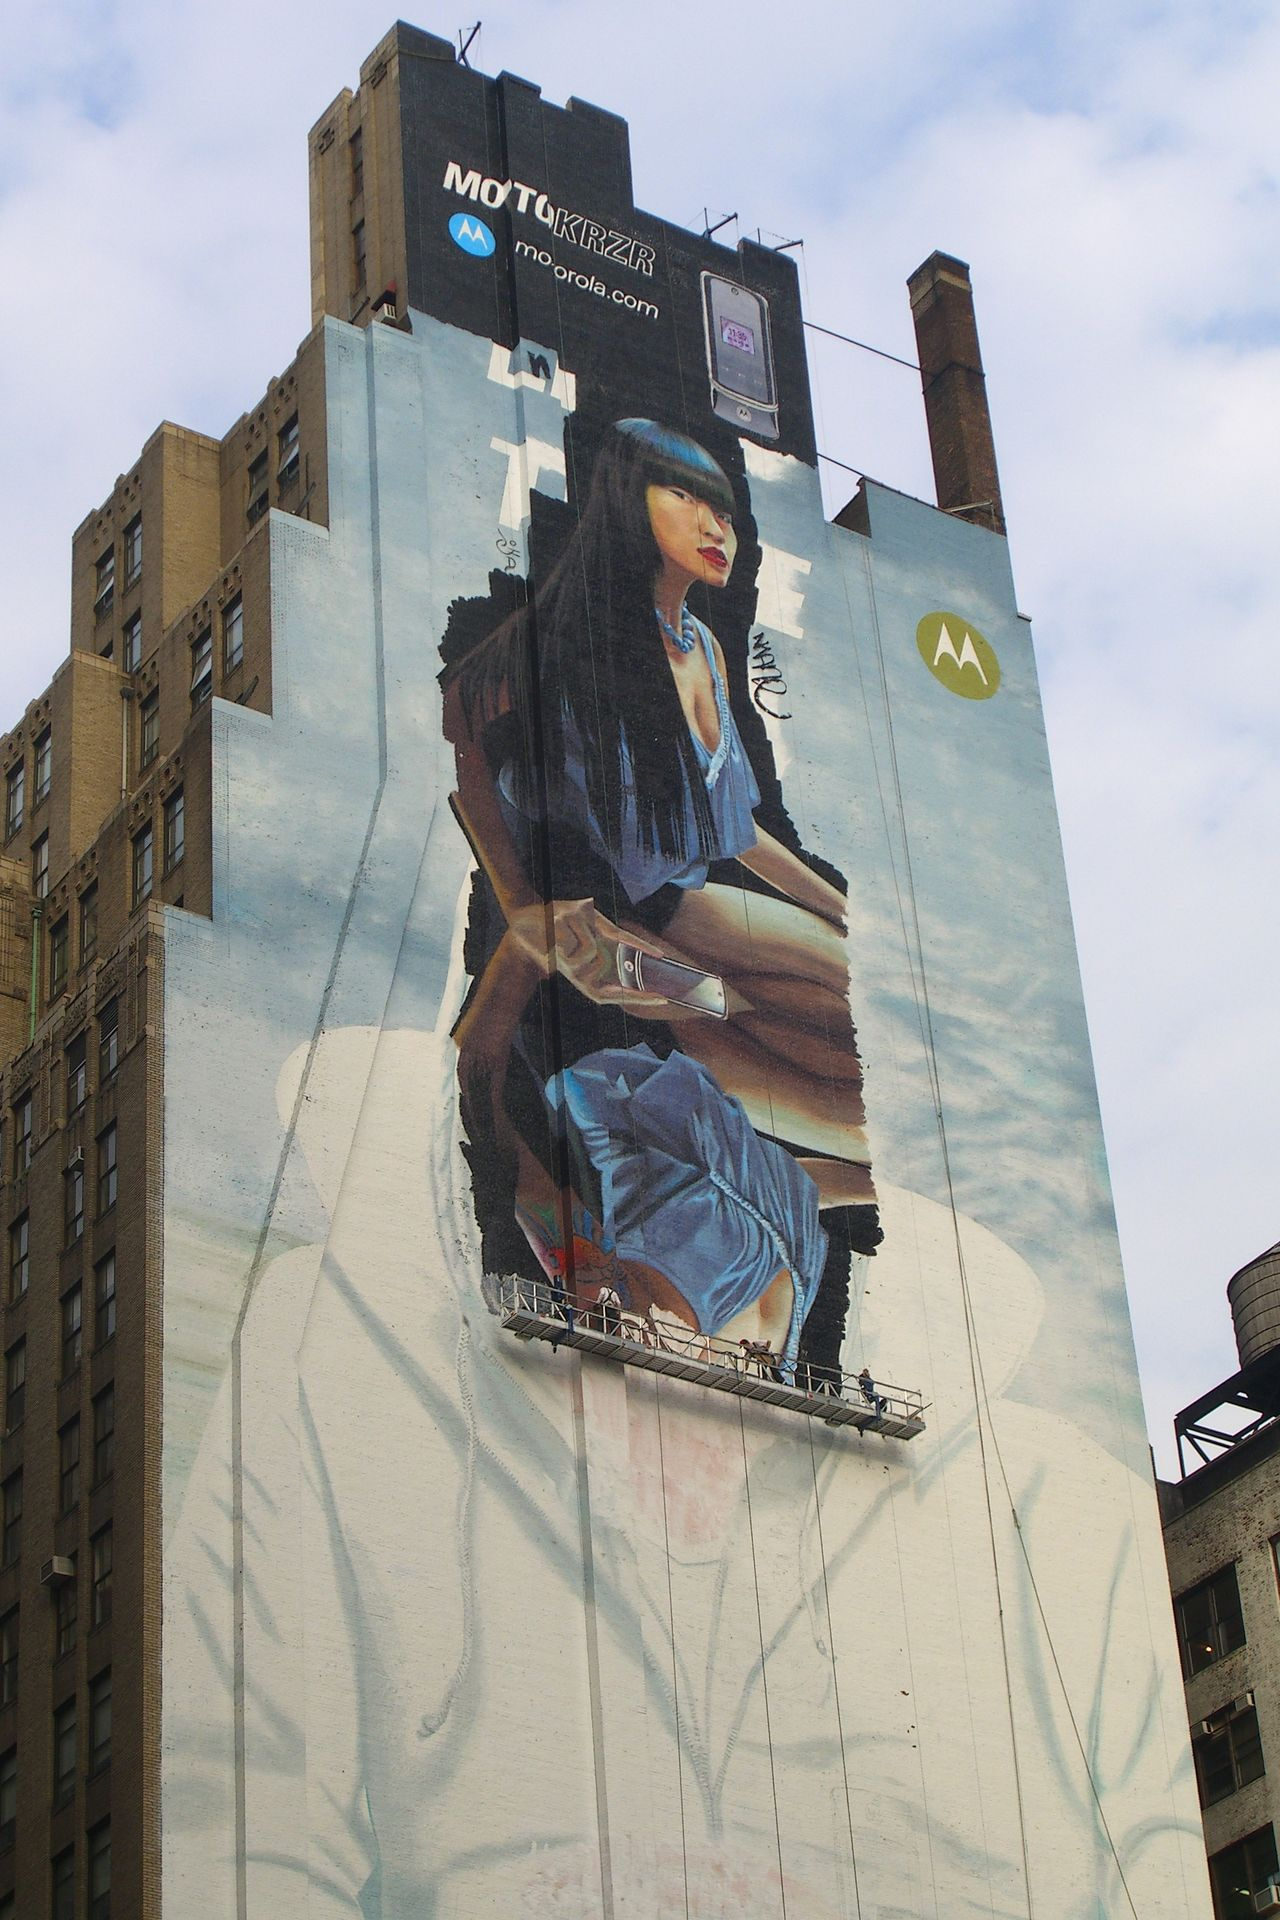 Advertisement ArtWork Building Facades Manhattan New York City Picture Still Life